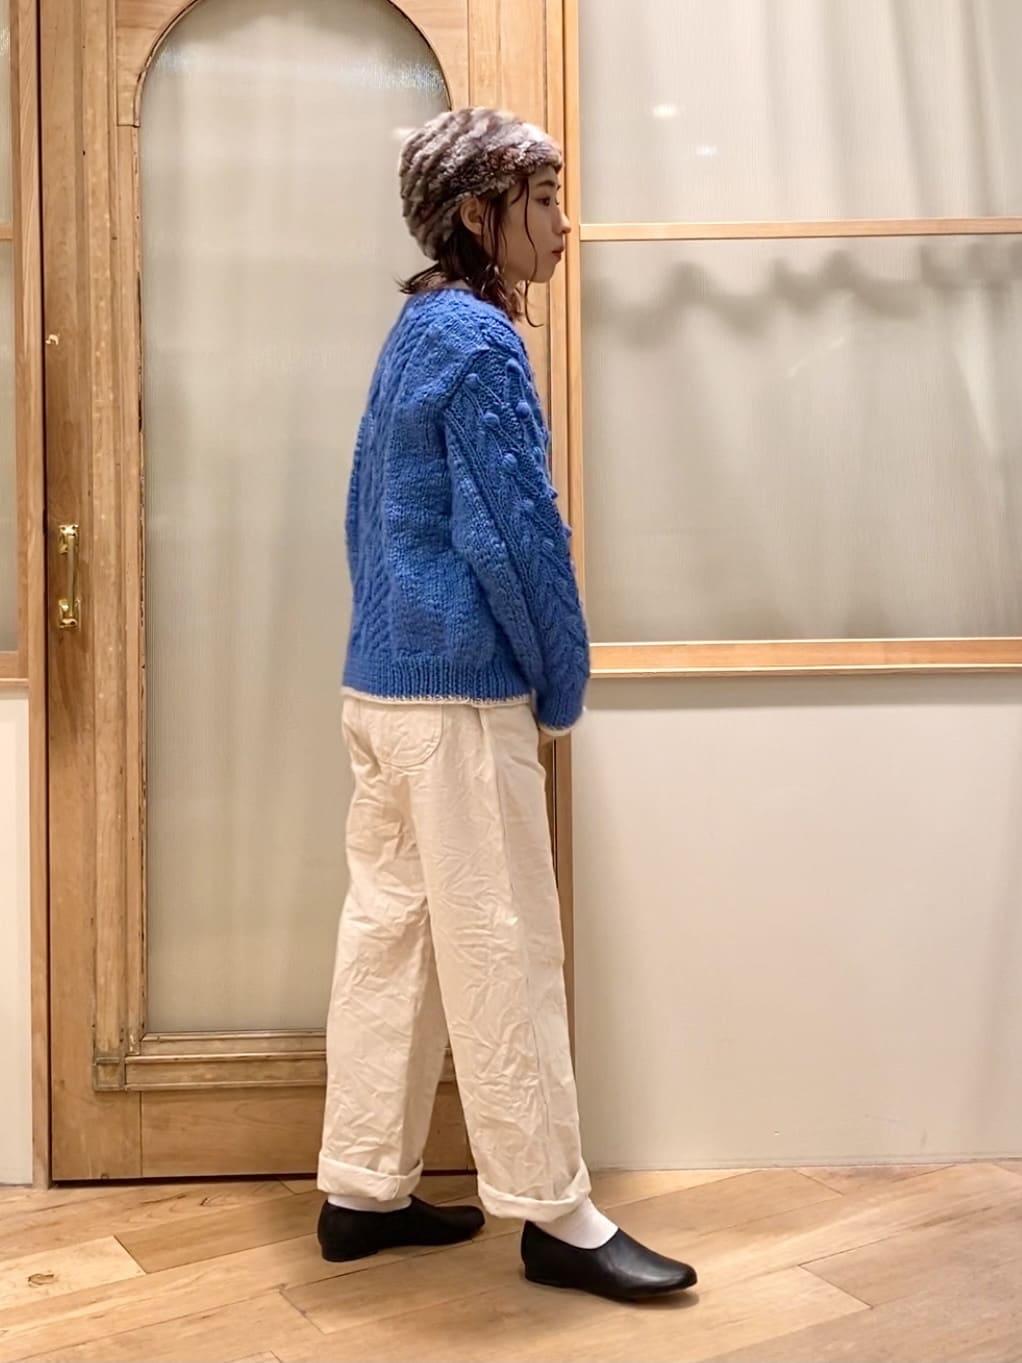 bulle de savon 新宿ミロード 身長:157cm 2021.09.21